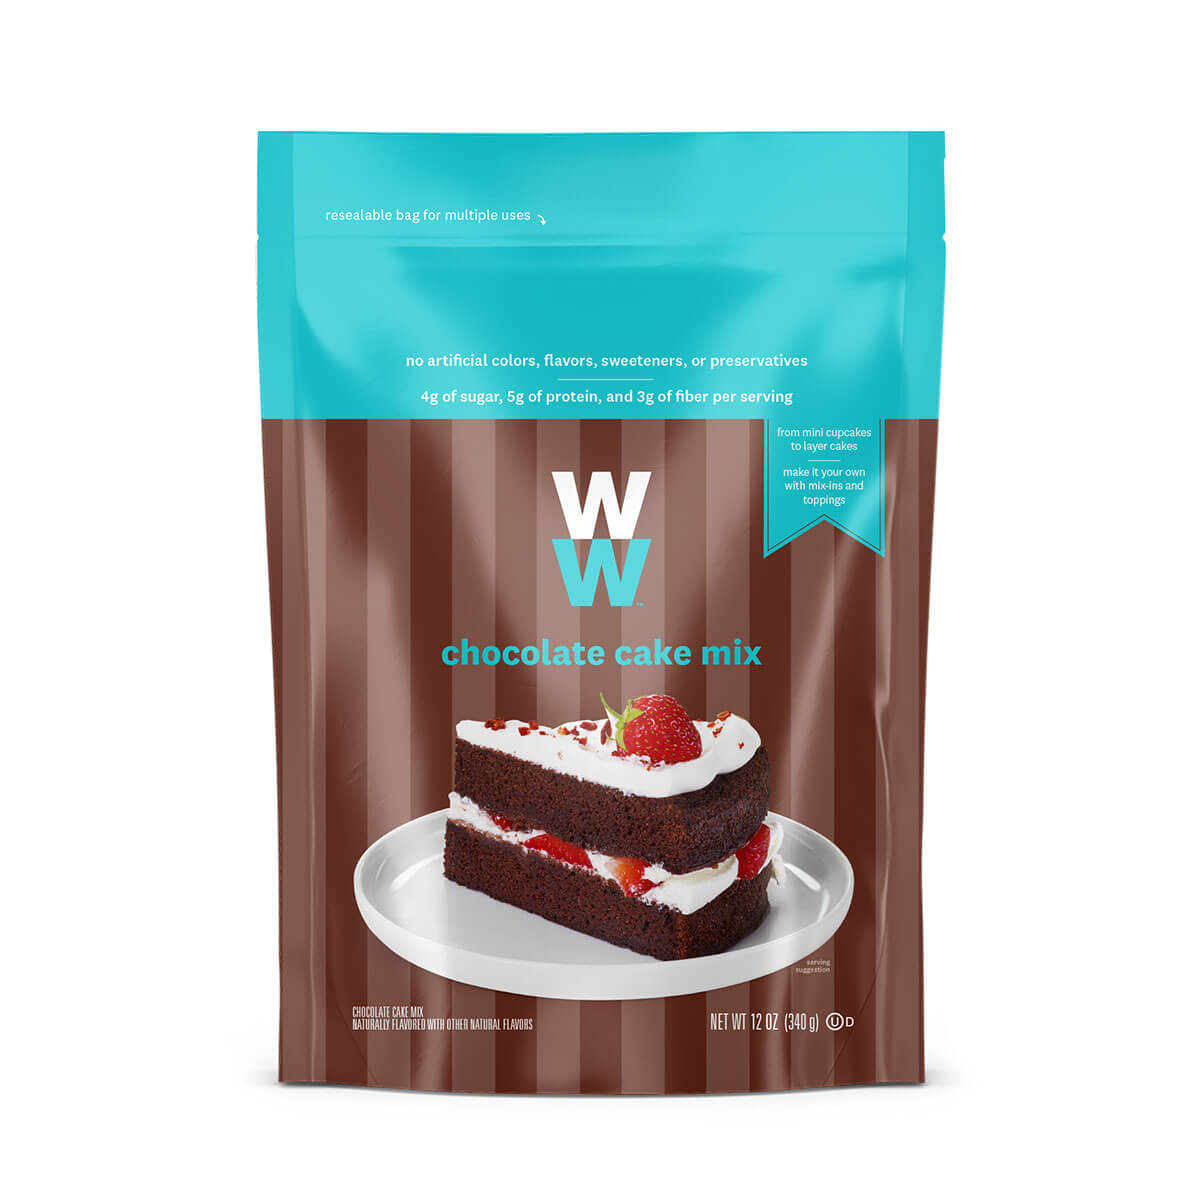 Fudge Brownie Mug Cake Mix Ww Shop Weight Watchers Online Store